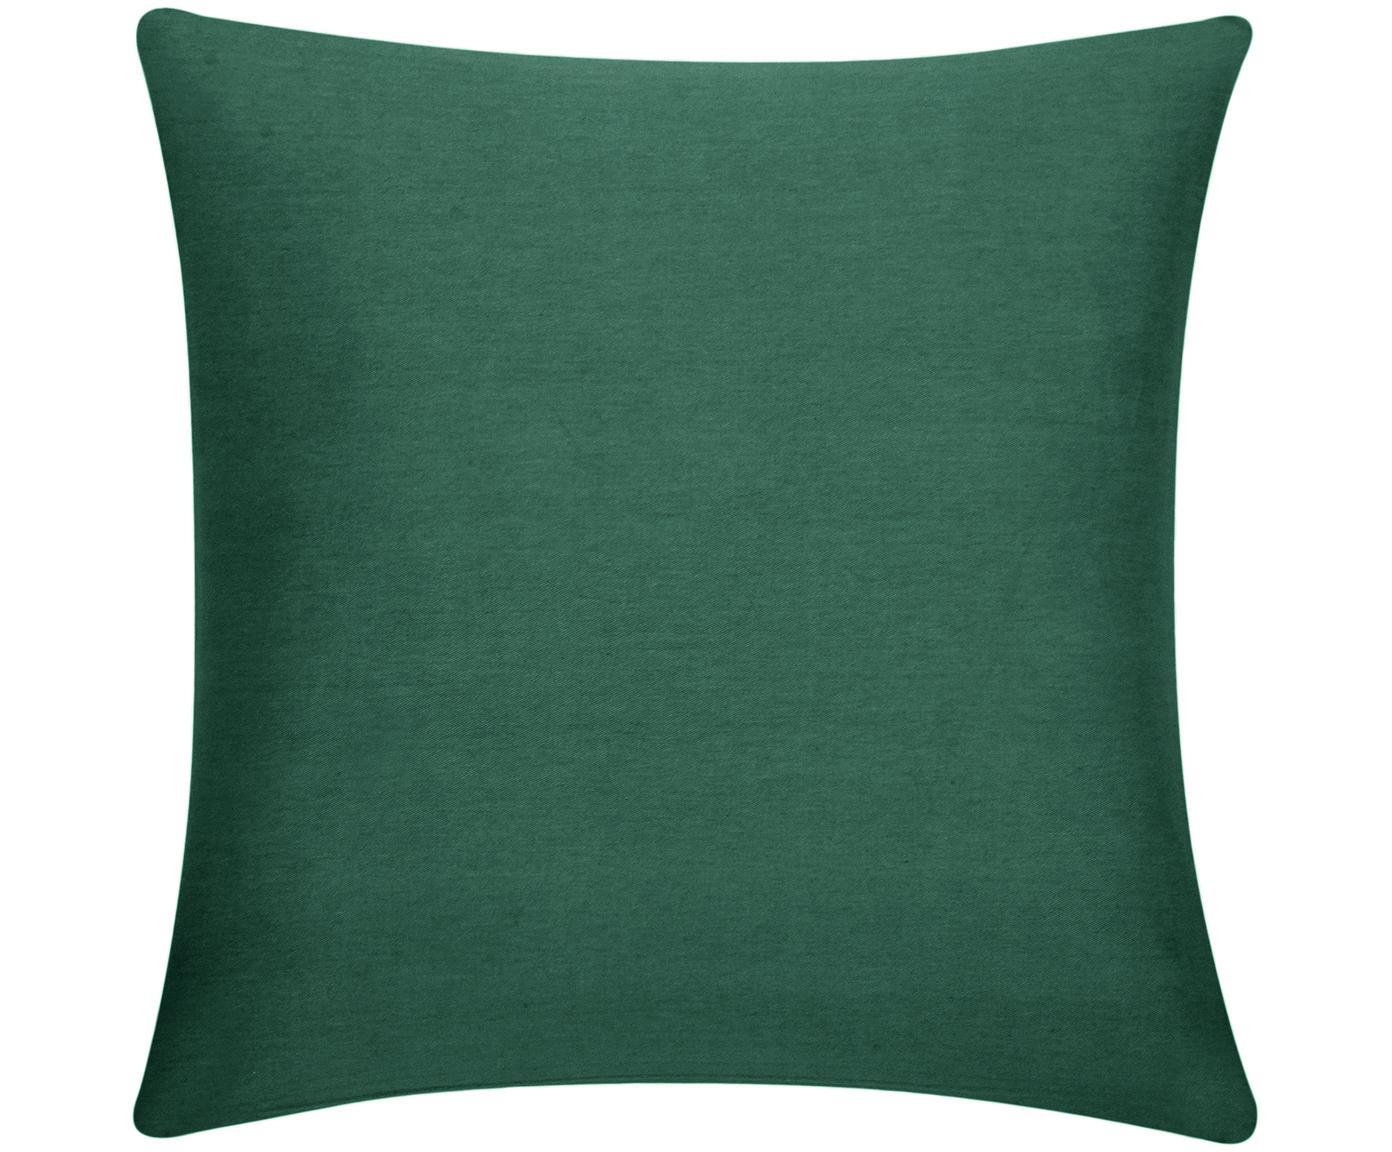 Federa arredo in cotone Mads, Cotone, Verde, Larg. 40 x Lung. 40 cm